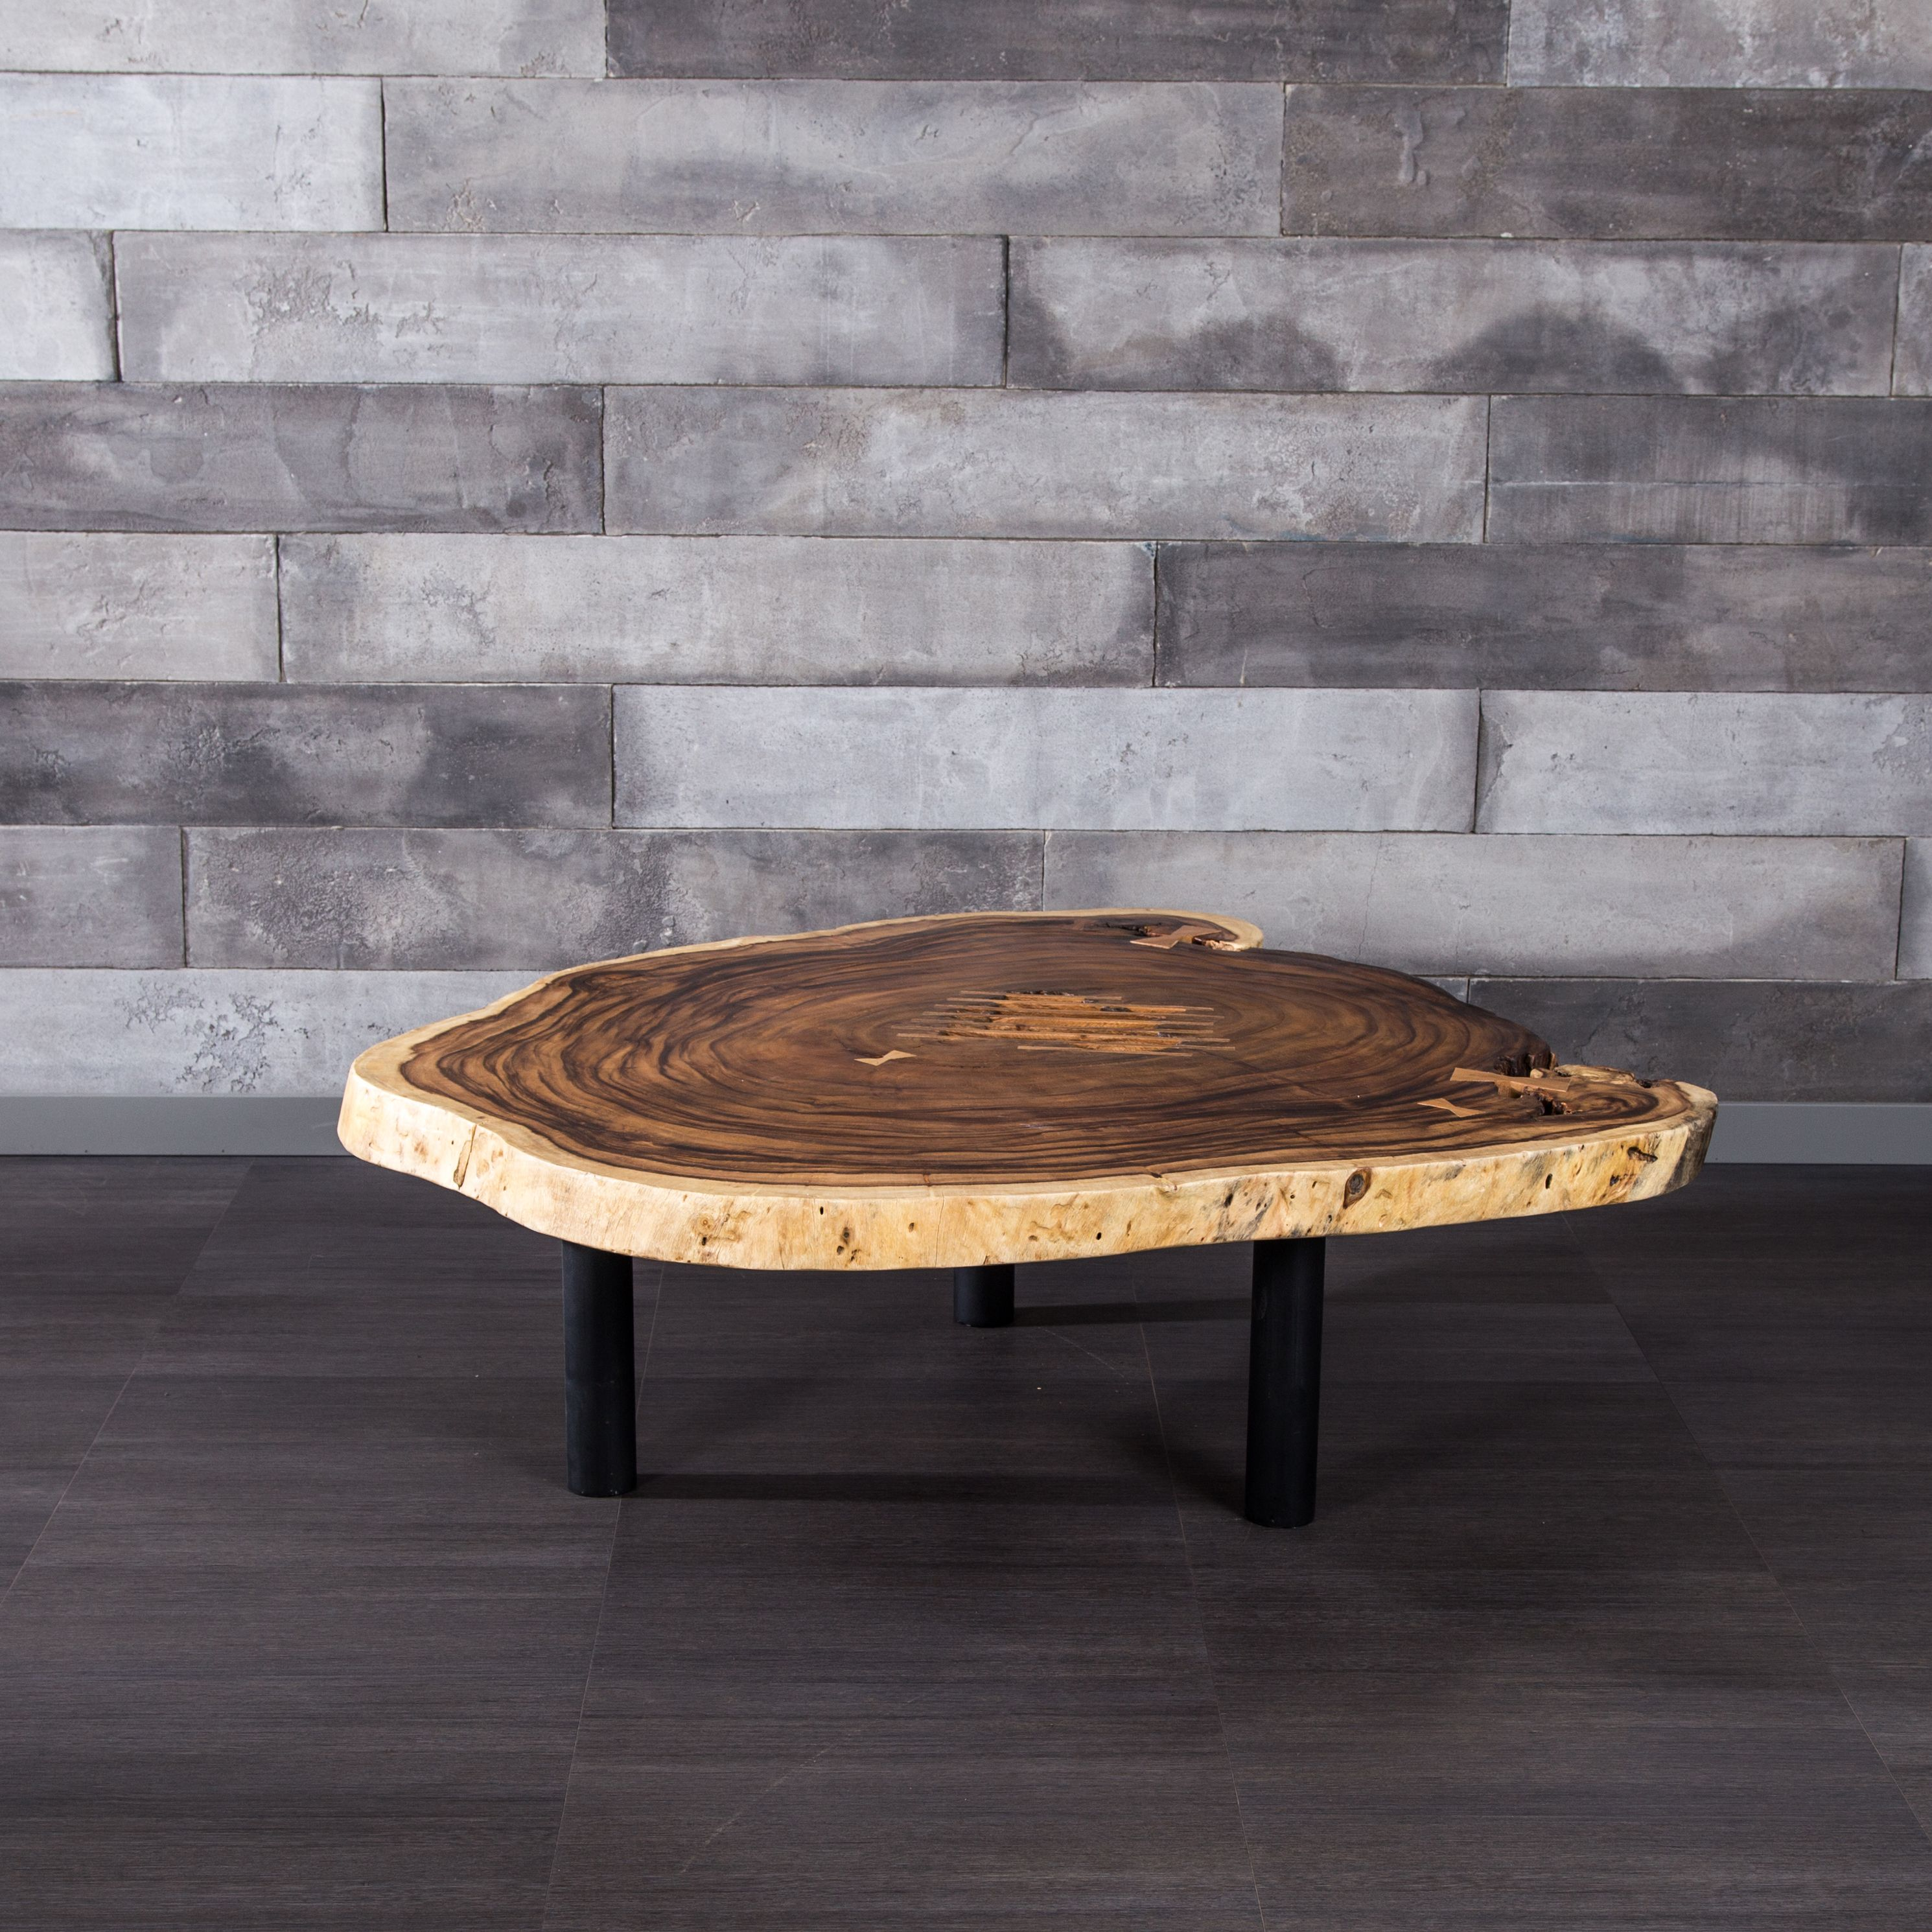 free form wood coffee table  Freeform Suar Wood Coffee Table With Metal Legs | TANYA ...